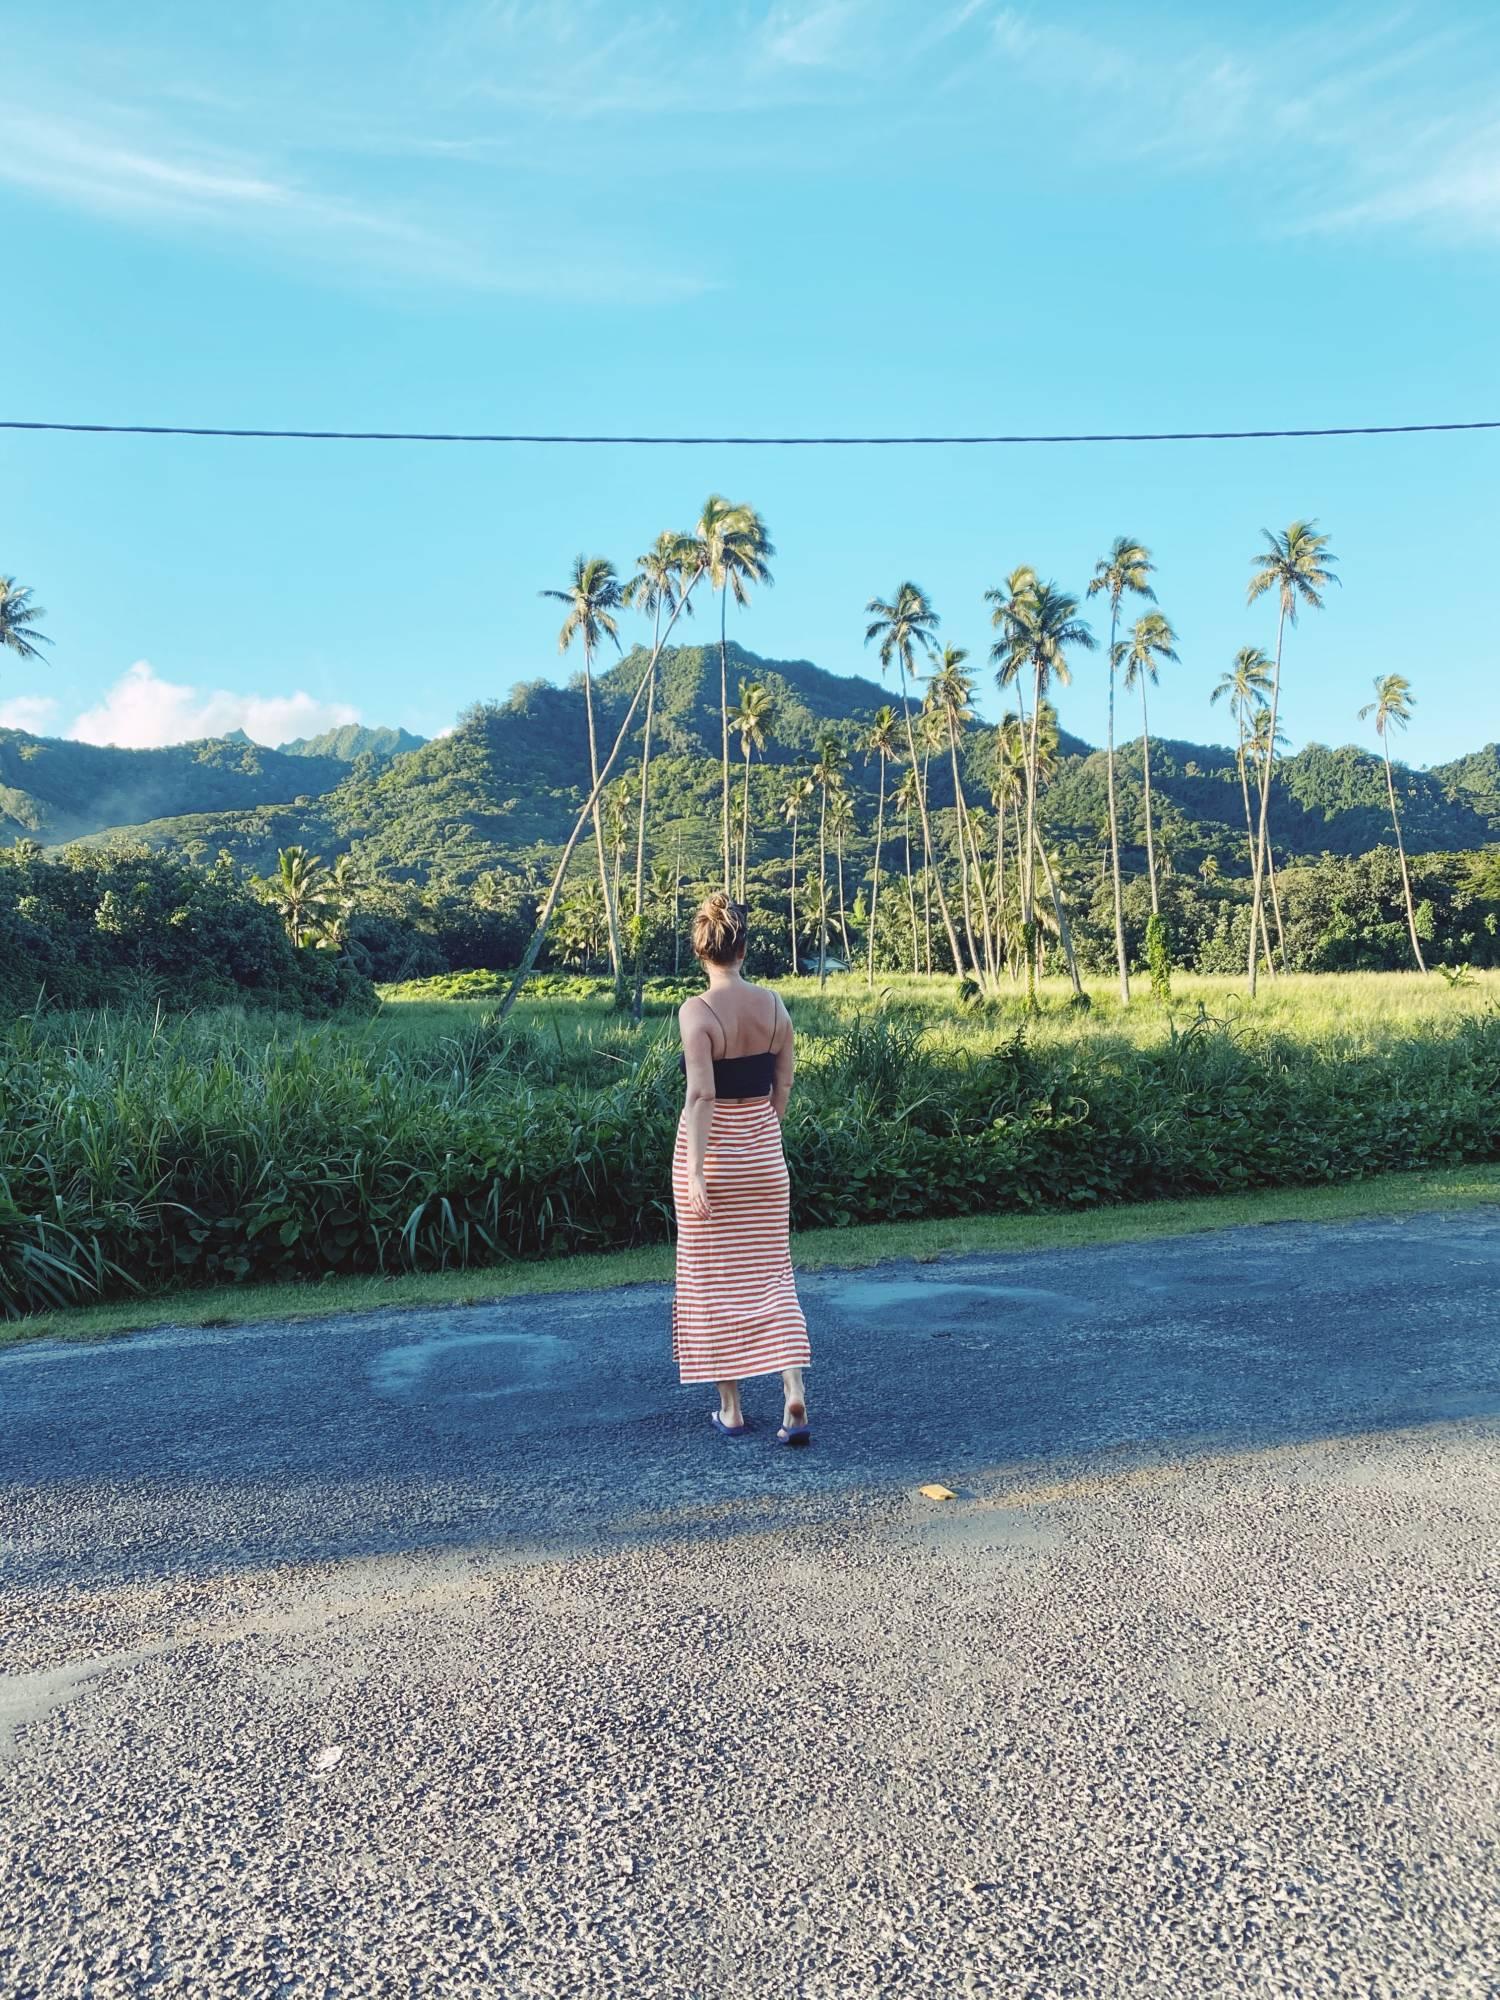 Cookinsaaret: Lokaalijuttuja, puhelinkuvia ja kauhunhetkiä pienkoneessa